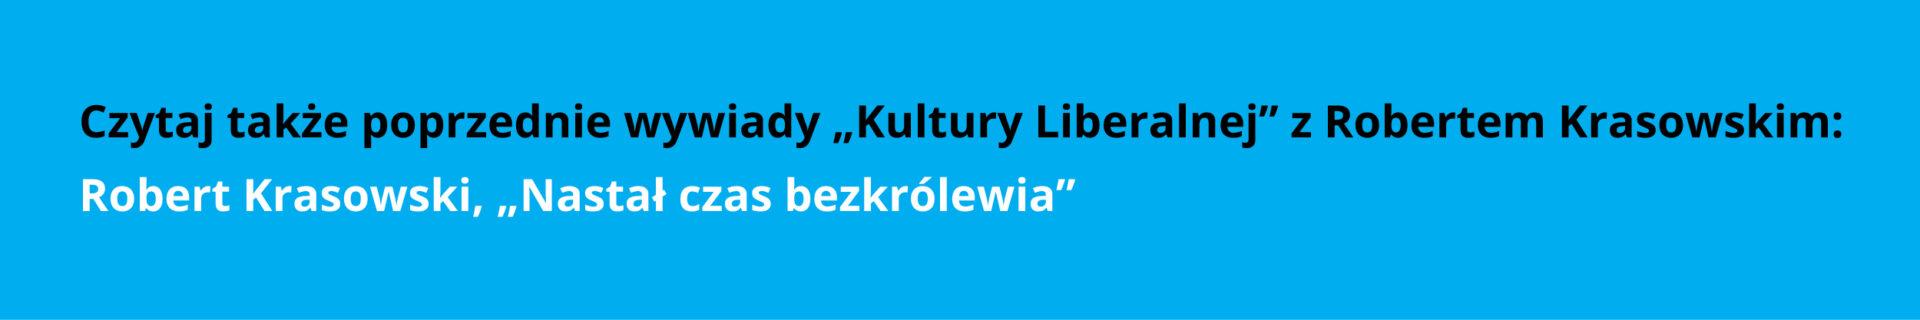 Krasowski_2